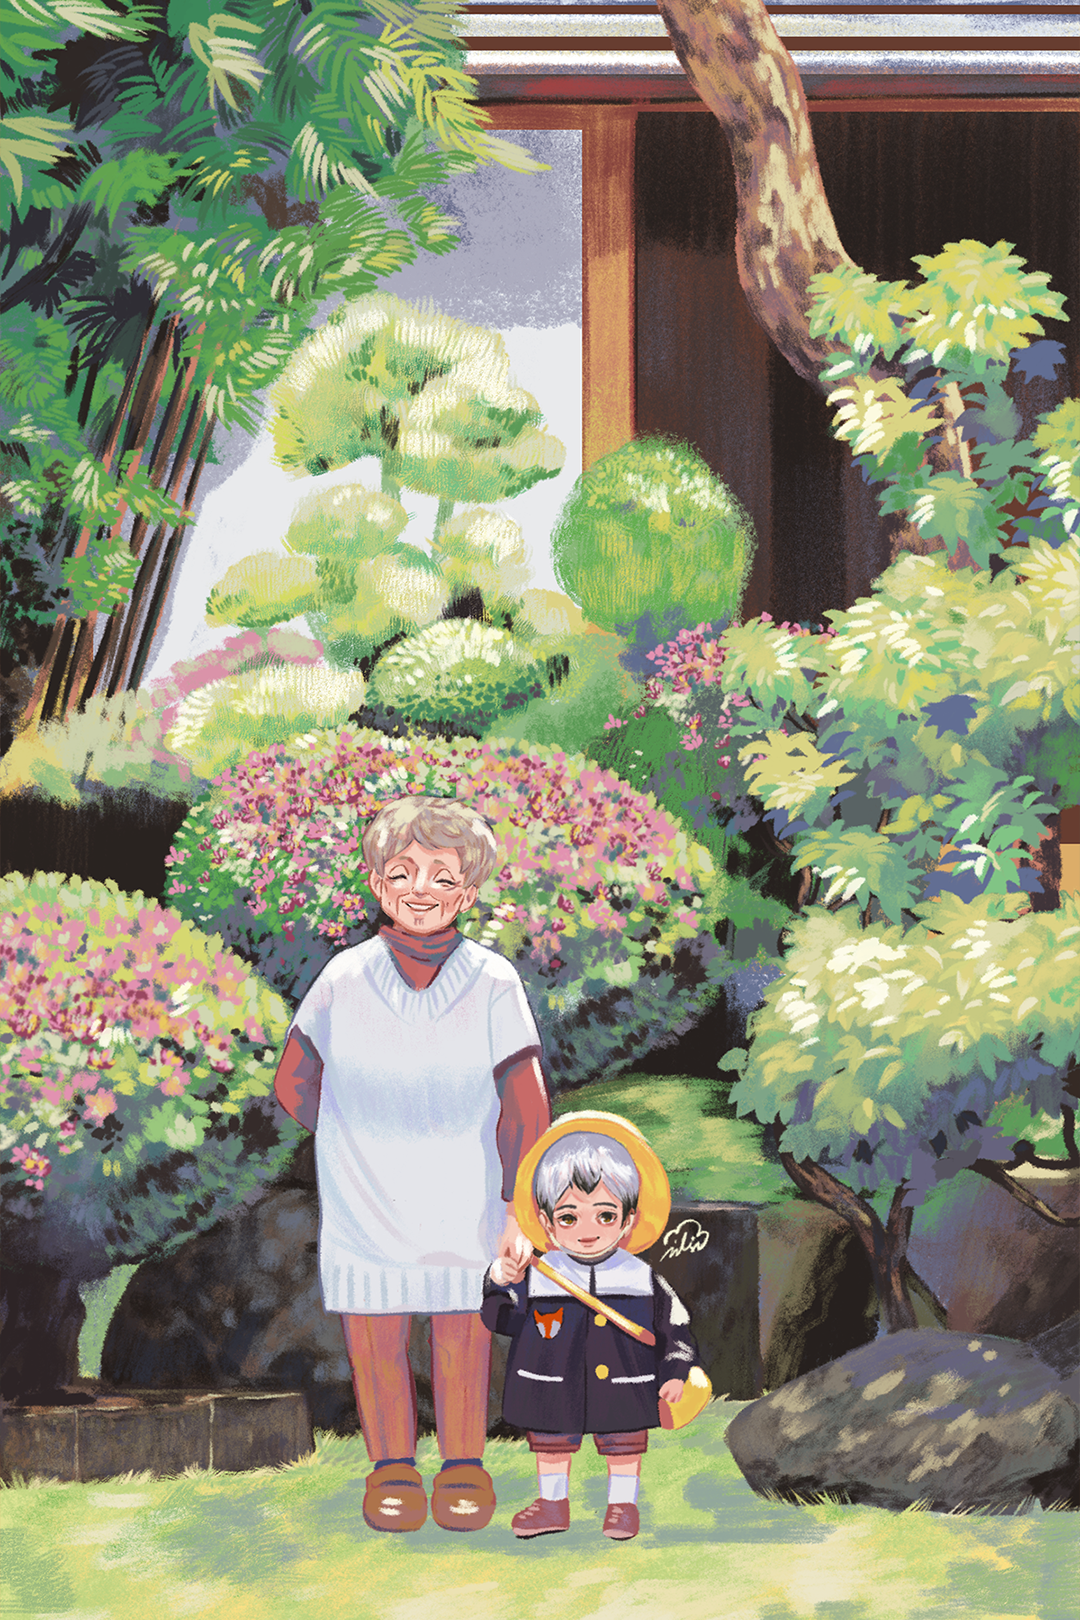 GirlsclubAsia-Illustration-Enid Din-Kita-Granny-4x4_300dpi